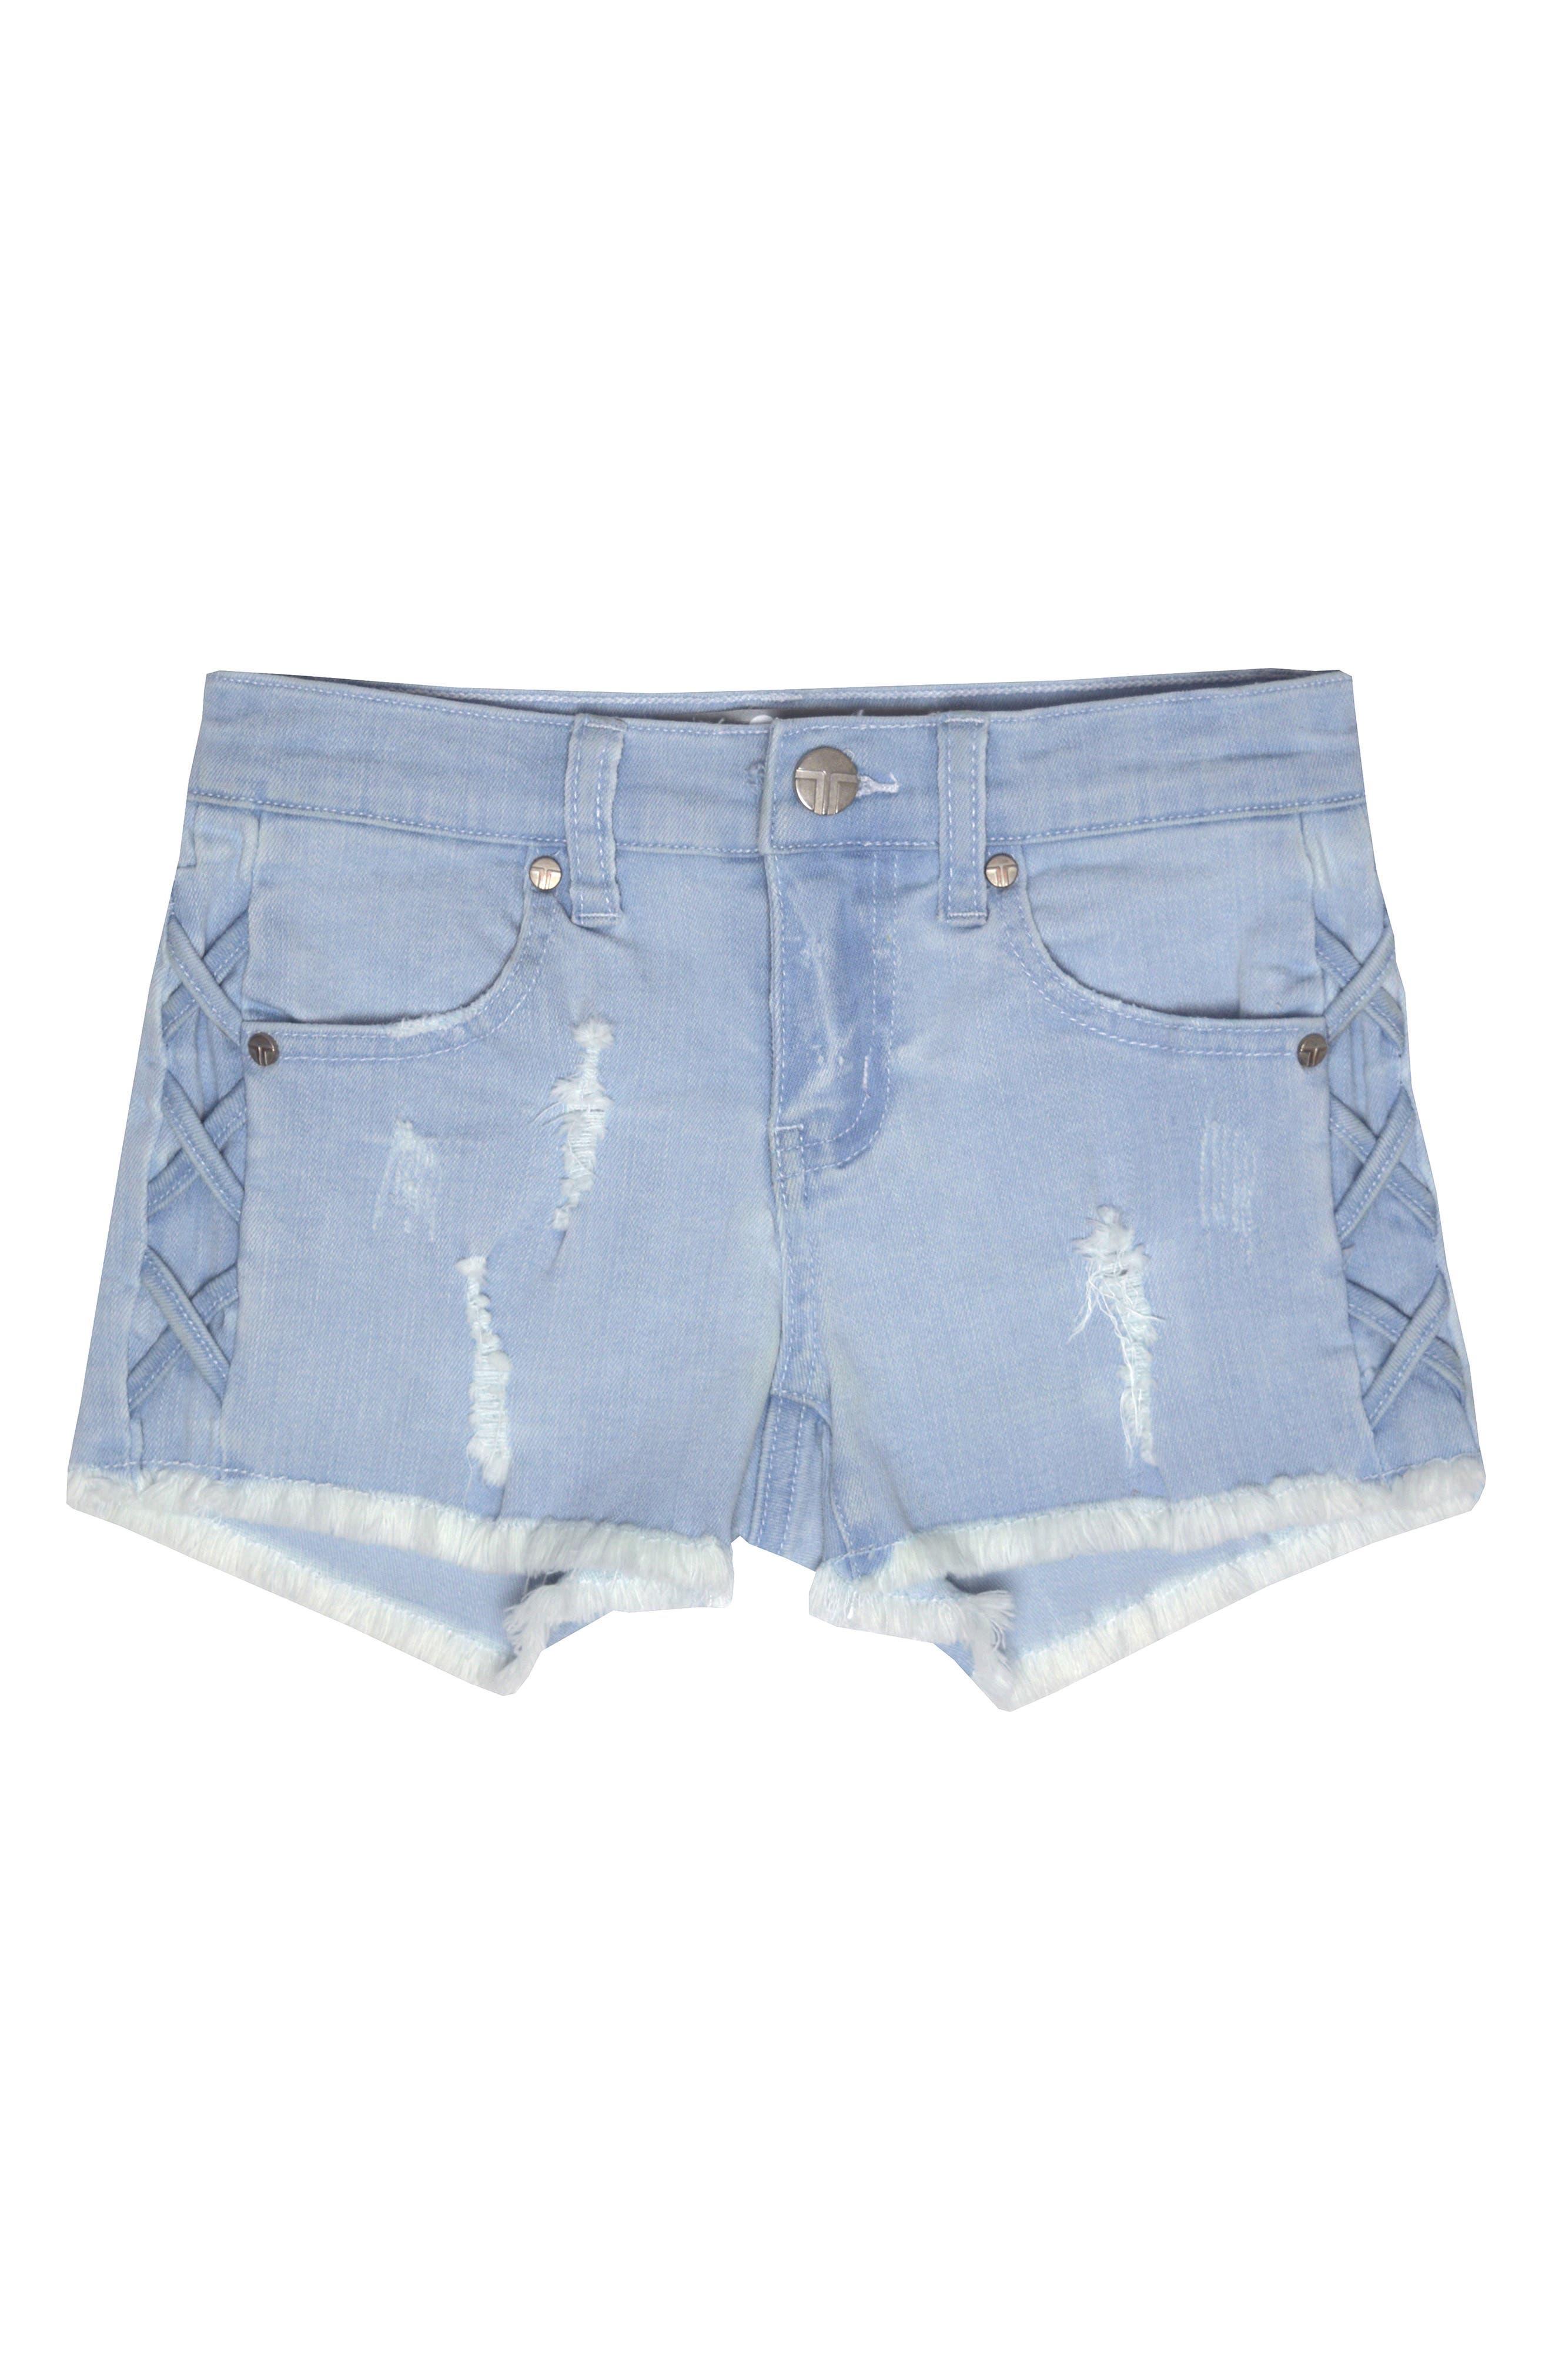 Distressed Cutoff Denim Shorts,                         Main,                         color, 461